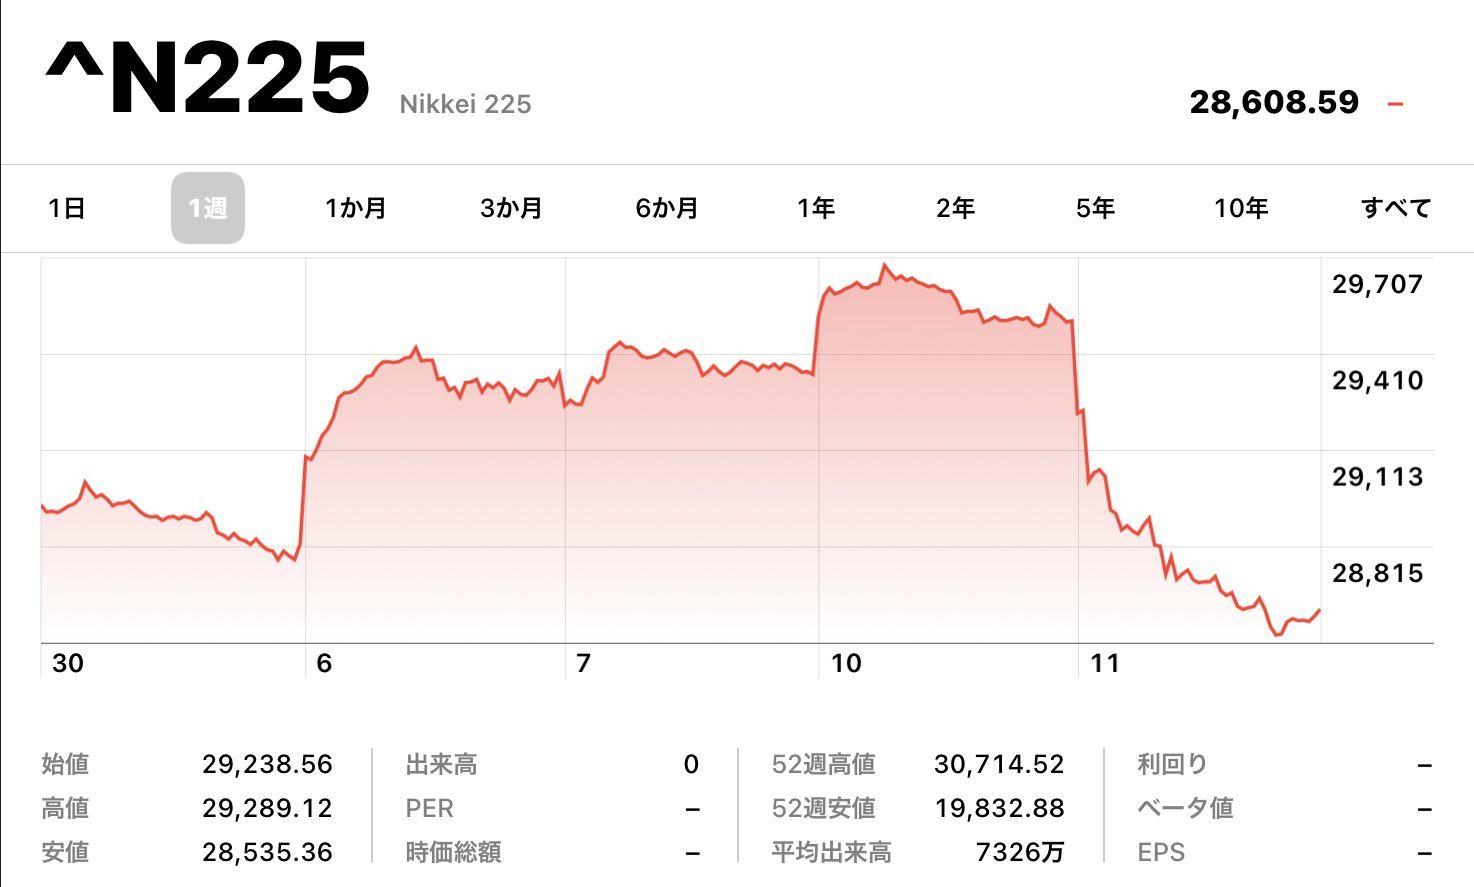 株価は続落、札幌・北海道の新規感染者は歴史的増加_c0025115_22293631.jpg